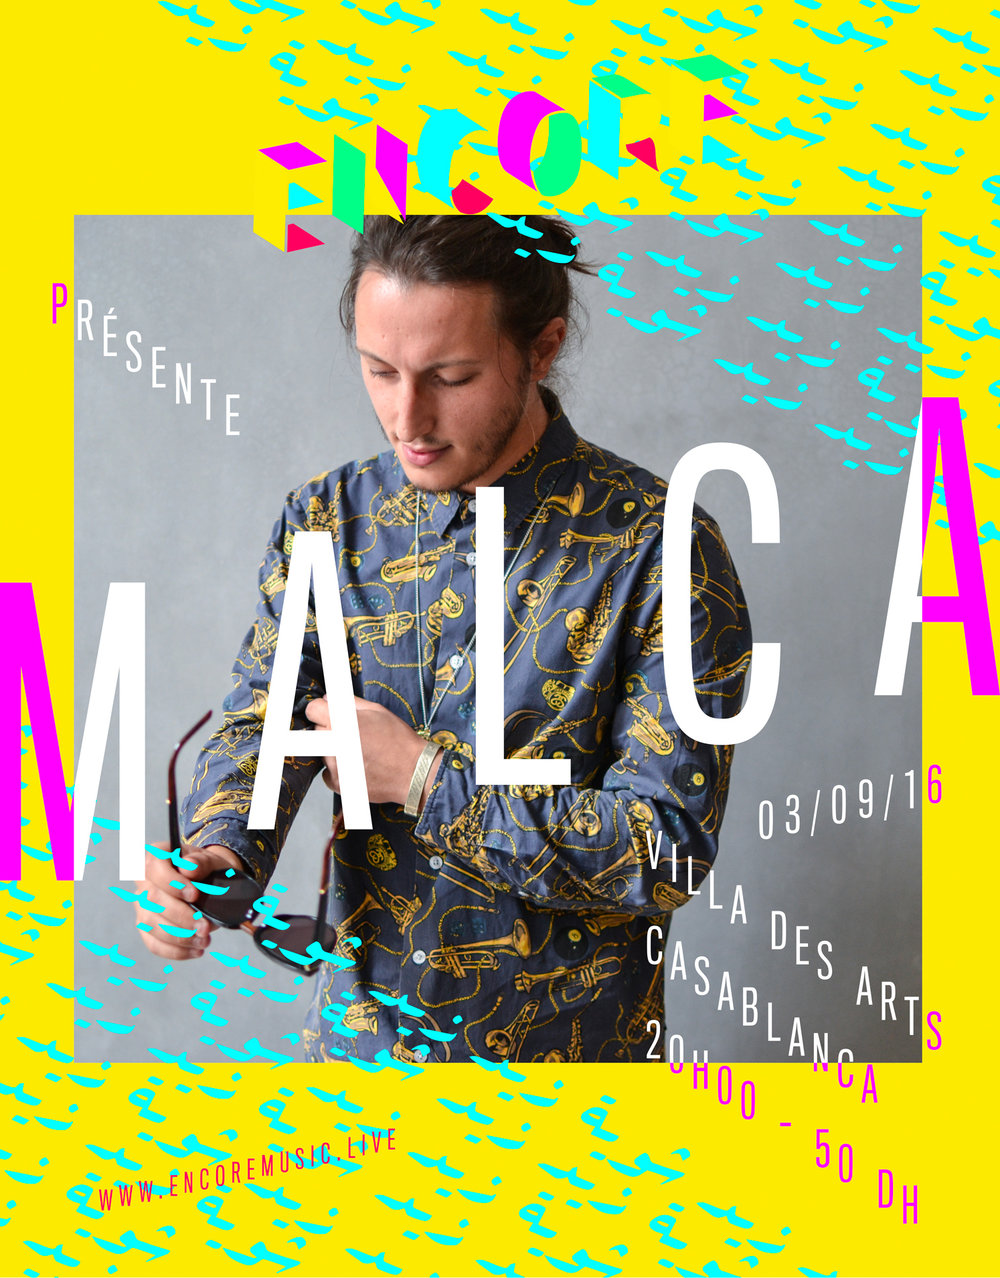 Affiche Web Malca - copie.jpg